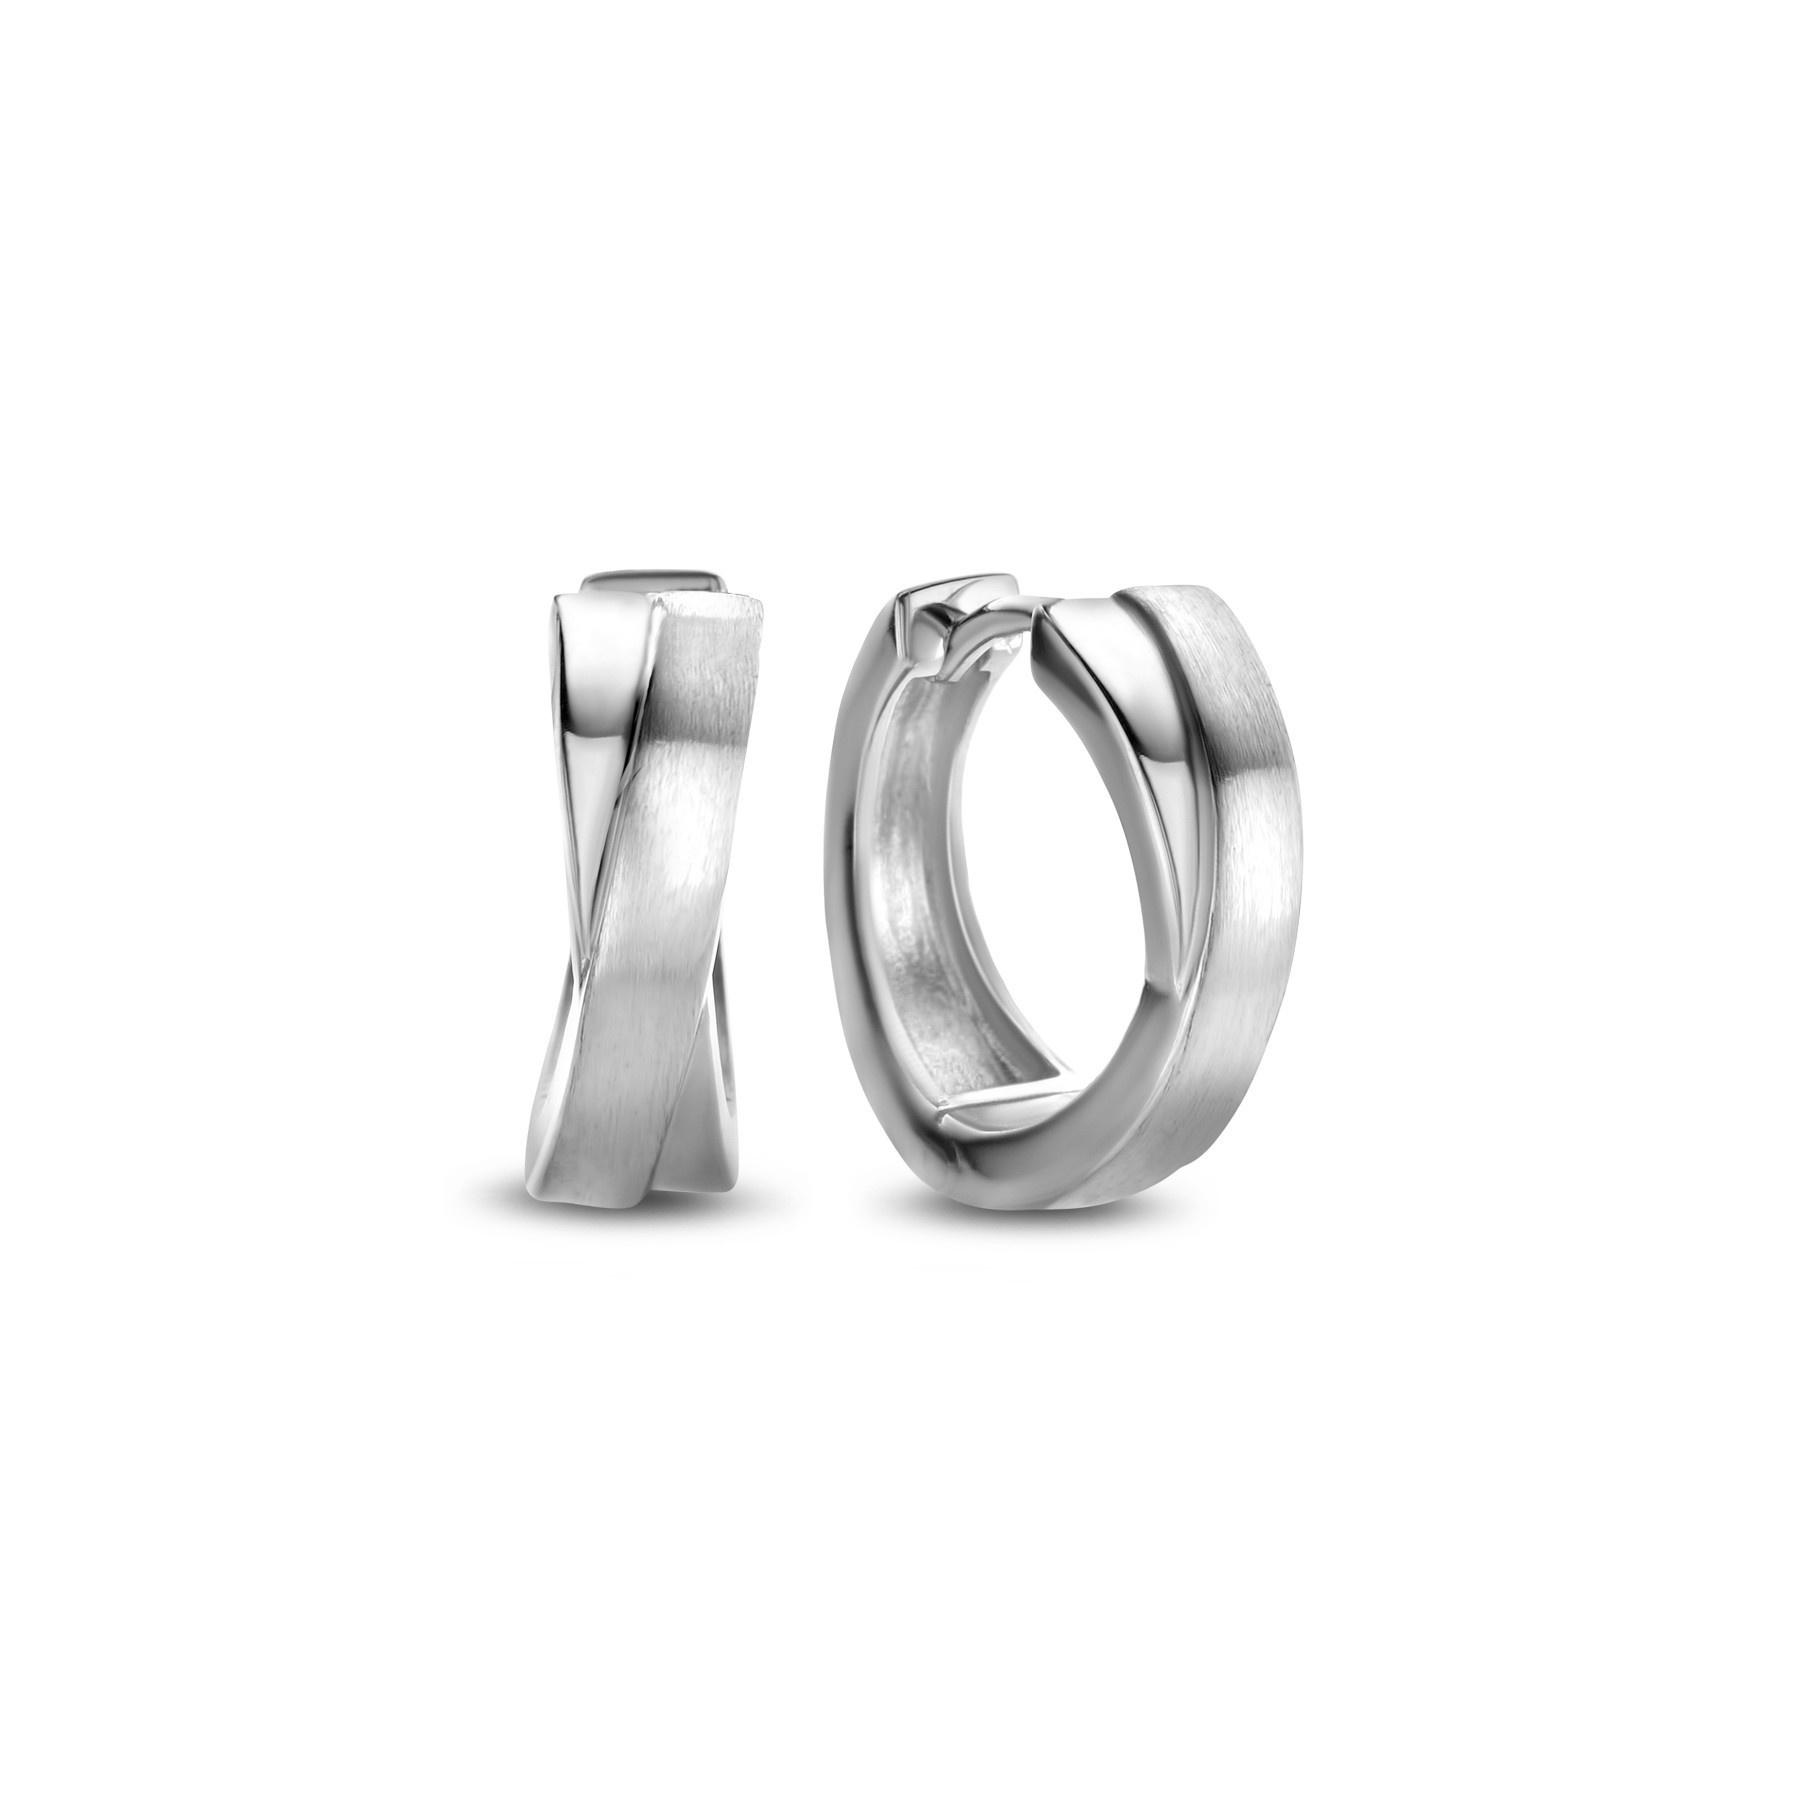 Parte di Me Bibbiena Poppi Casentino 925 sterling silver hoop earrings